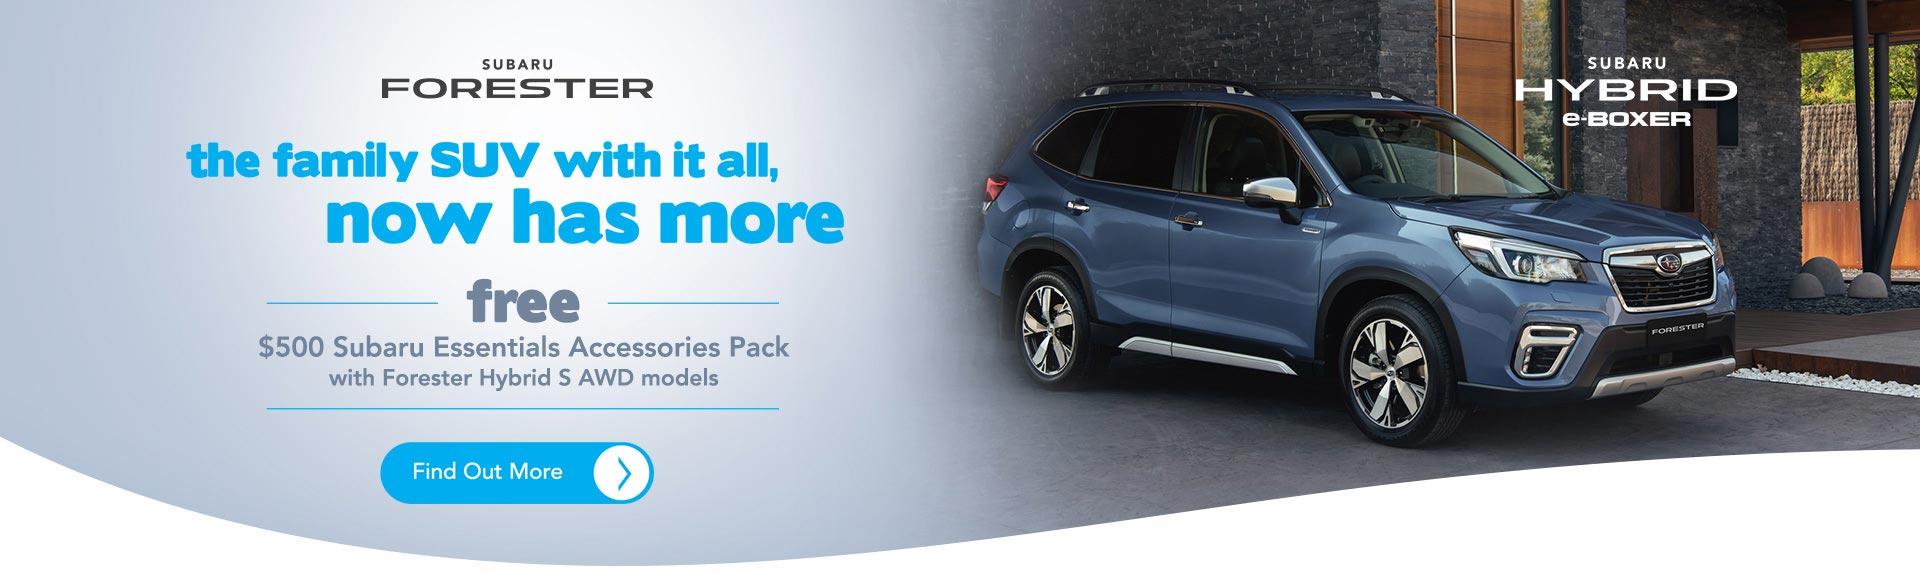 Trivett Subaru Forester Accessory Pack Offer